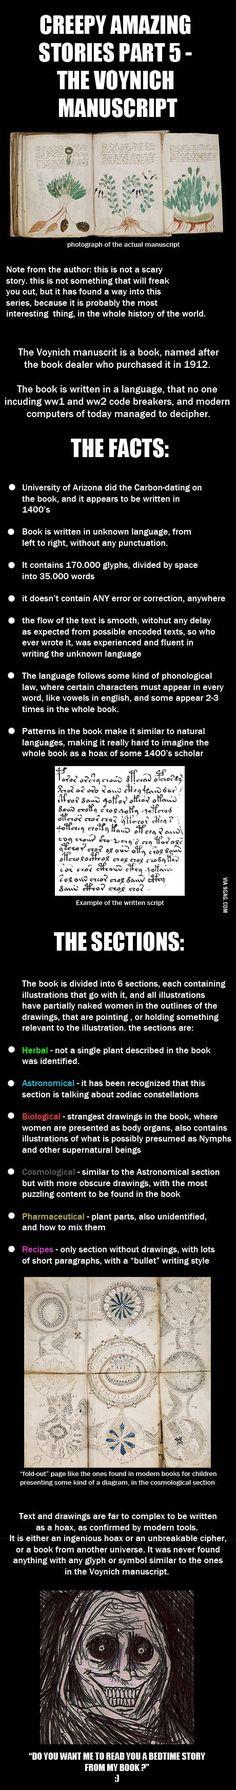 Amazing Stories - Voynich Manusript